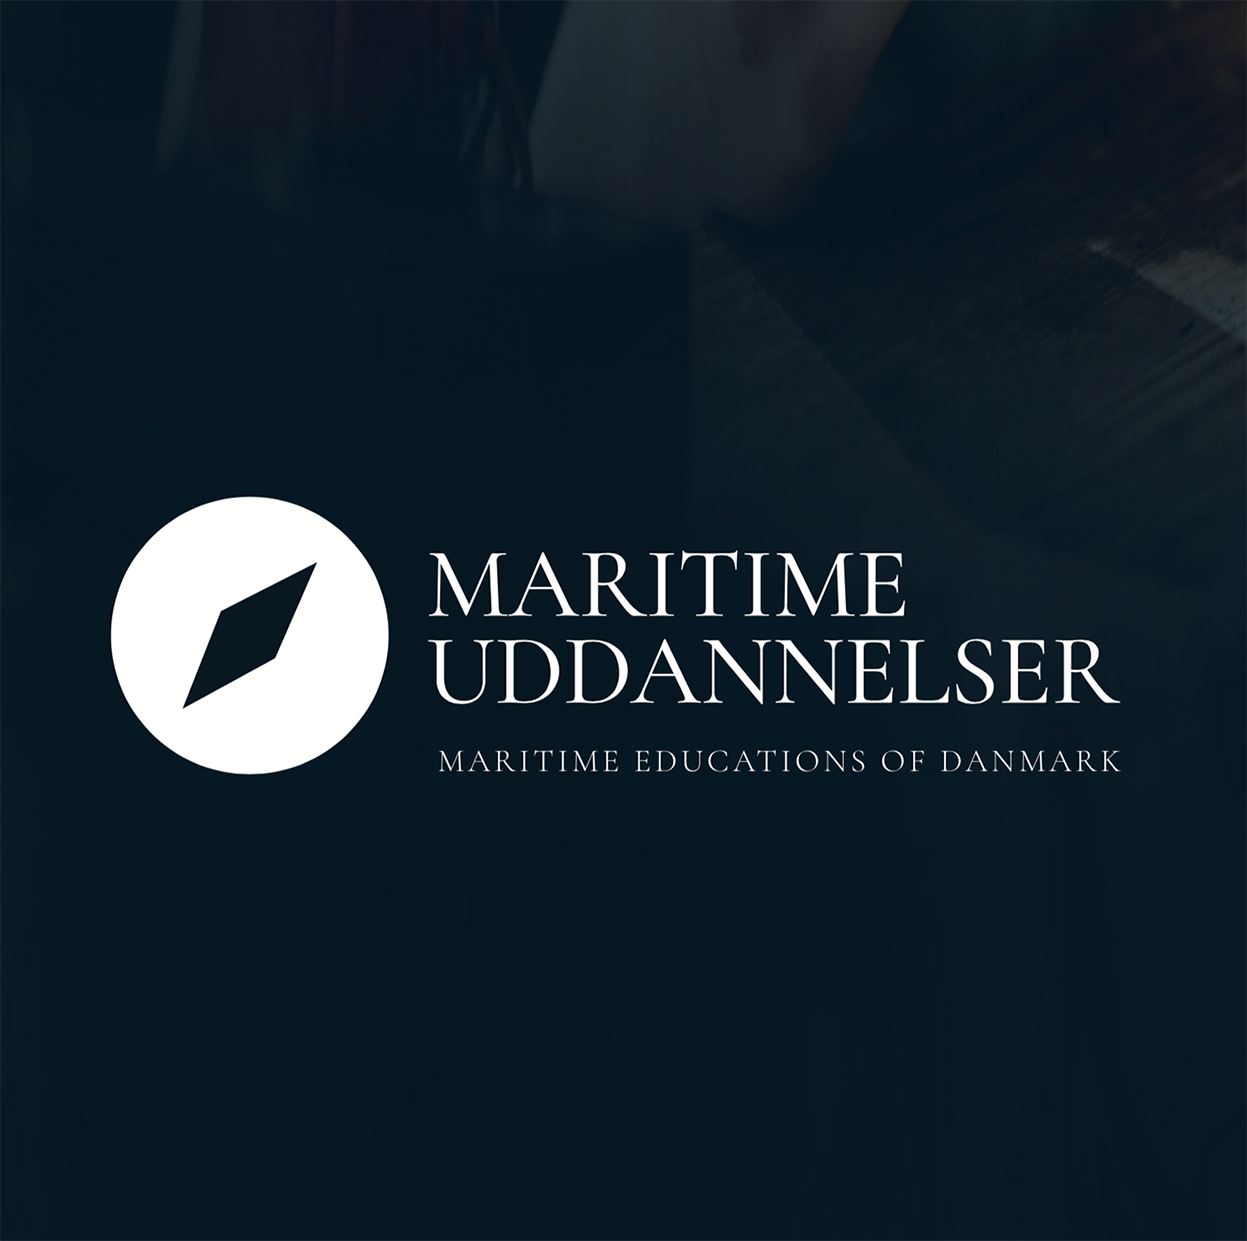 maritime uddannelser logo malene kyed